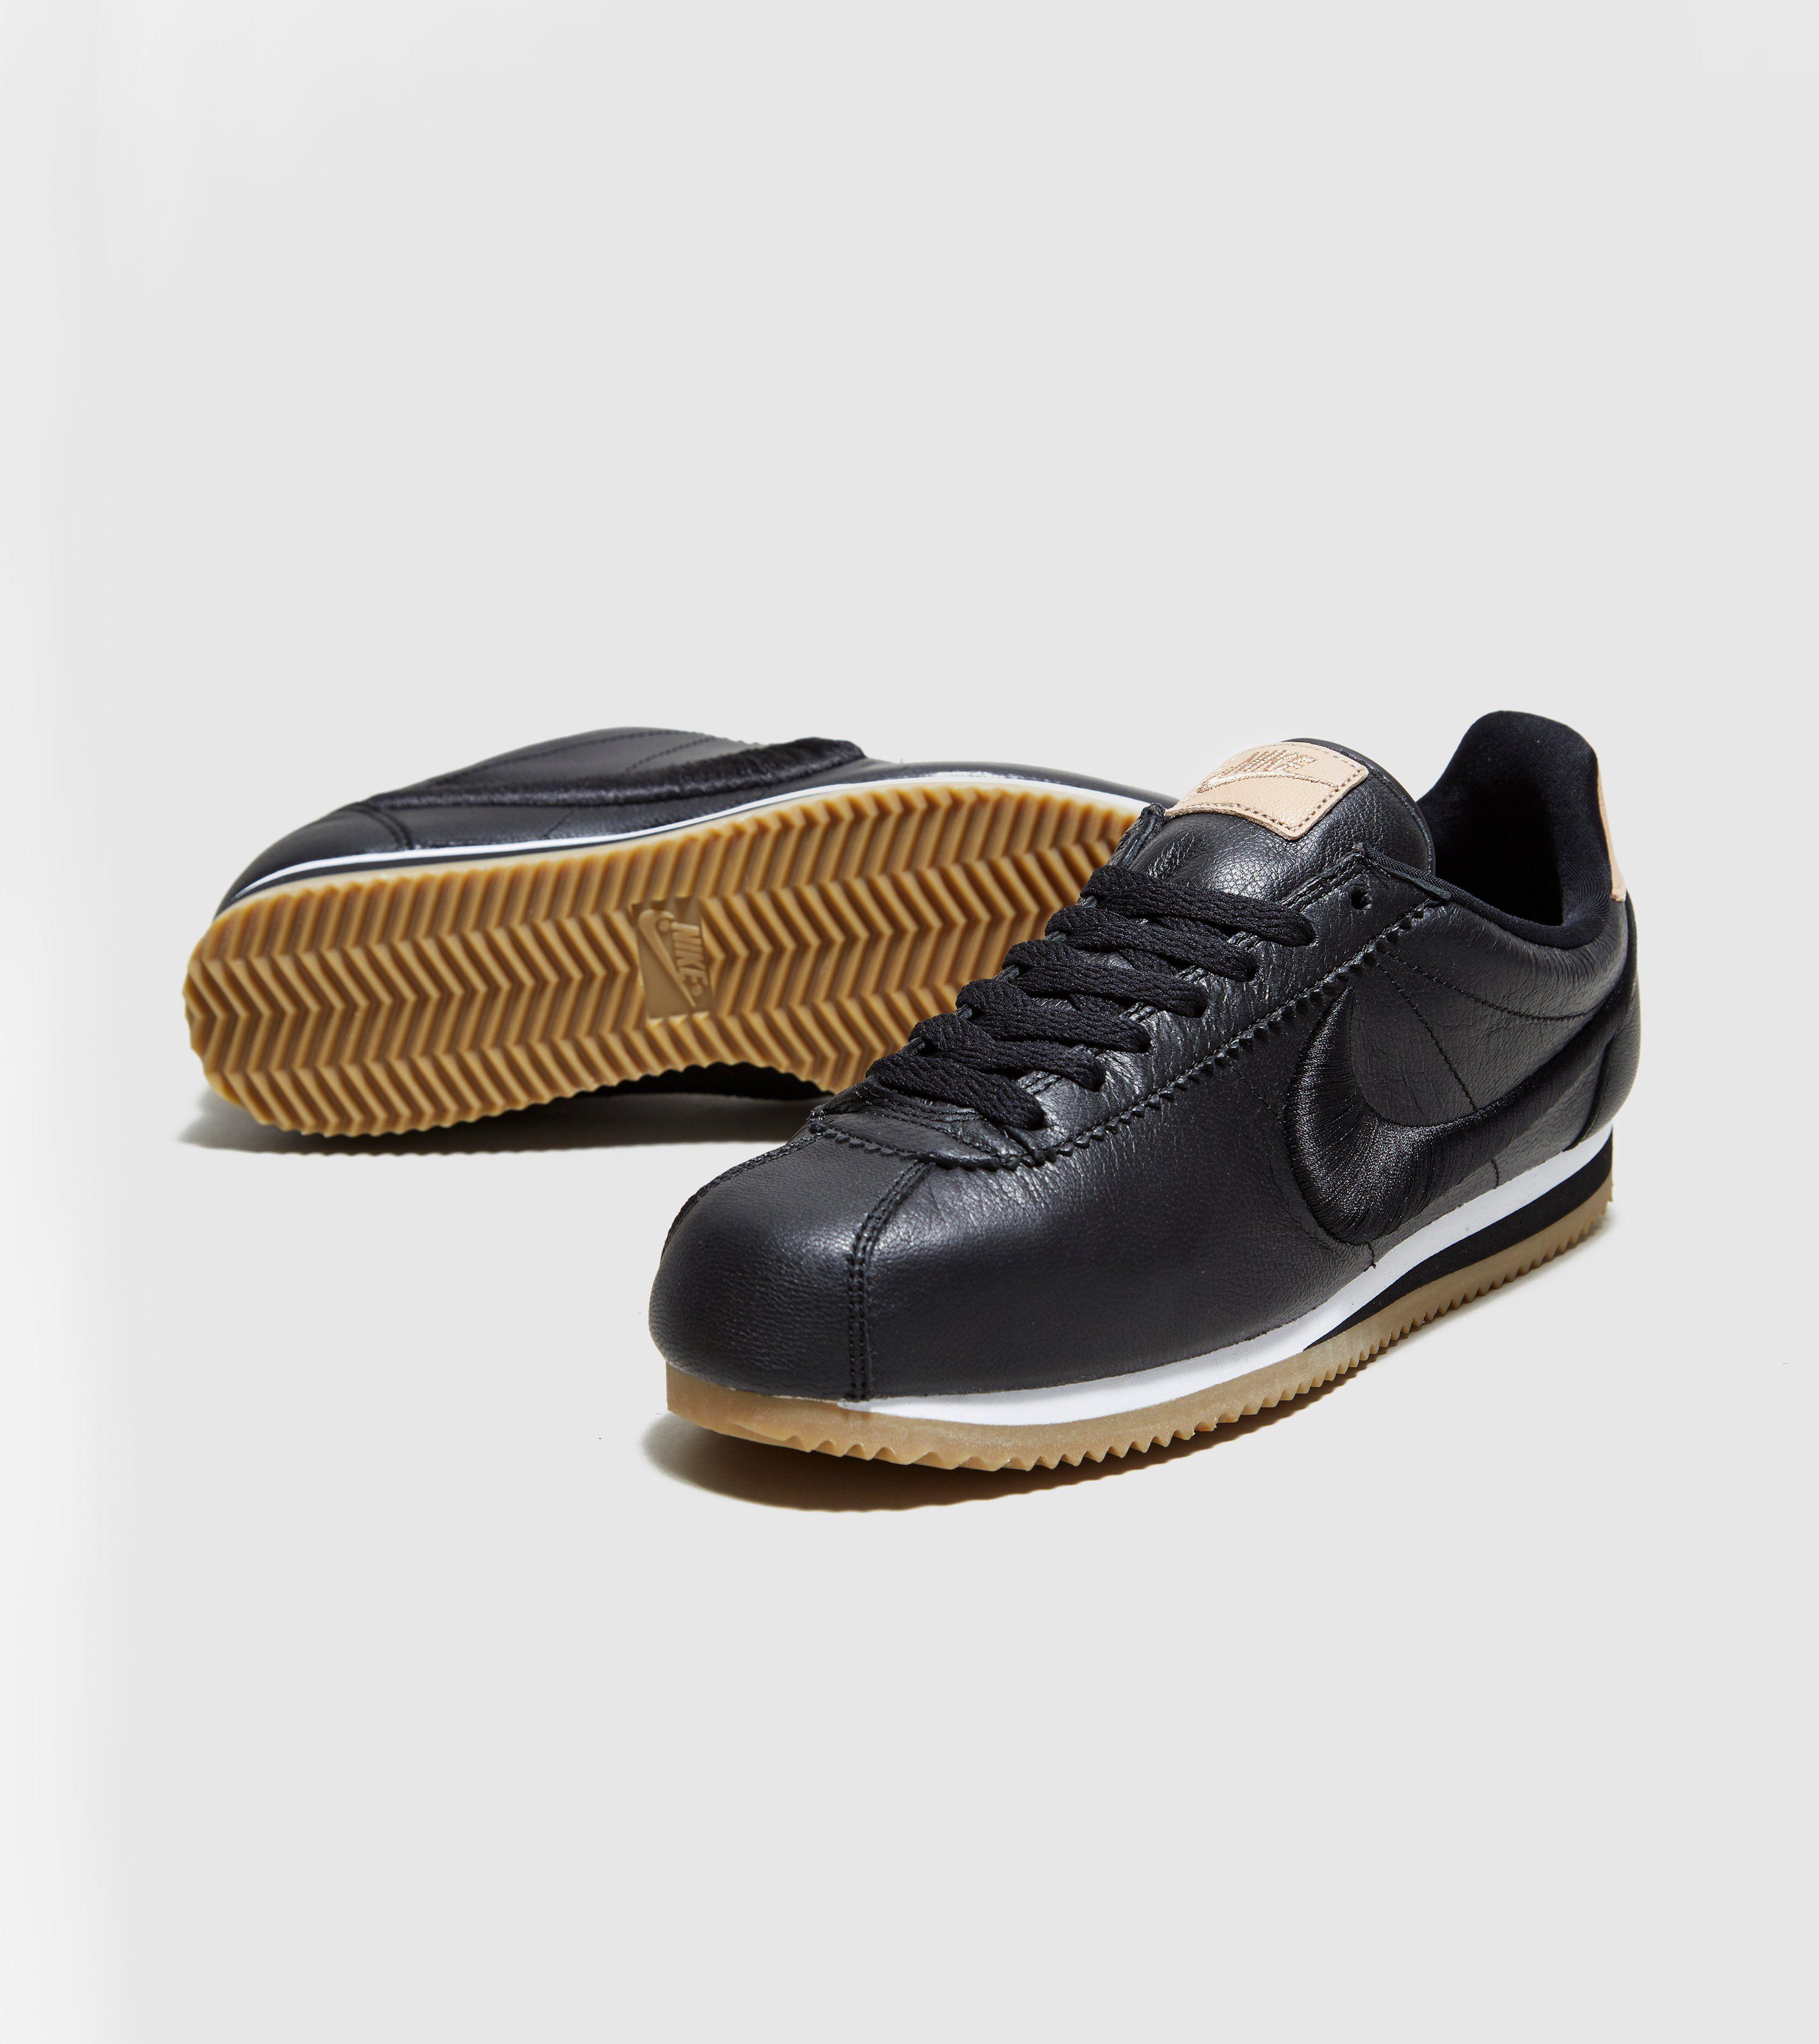 nike cortez premium leather